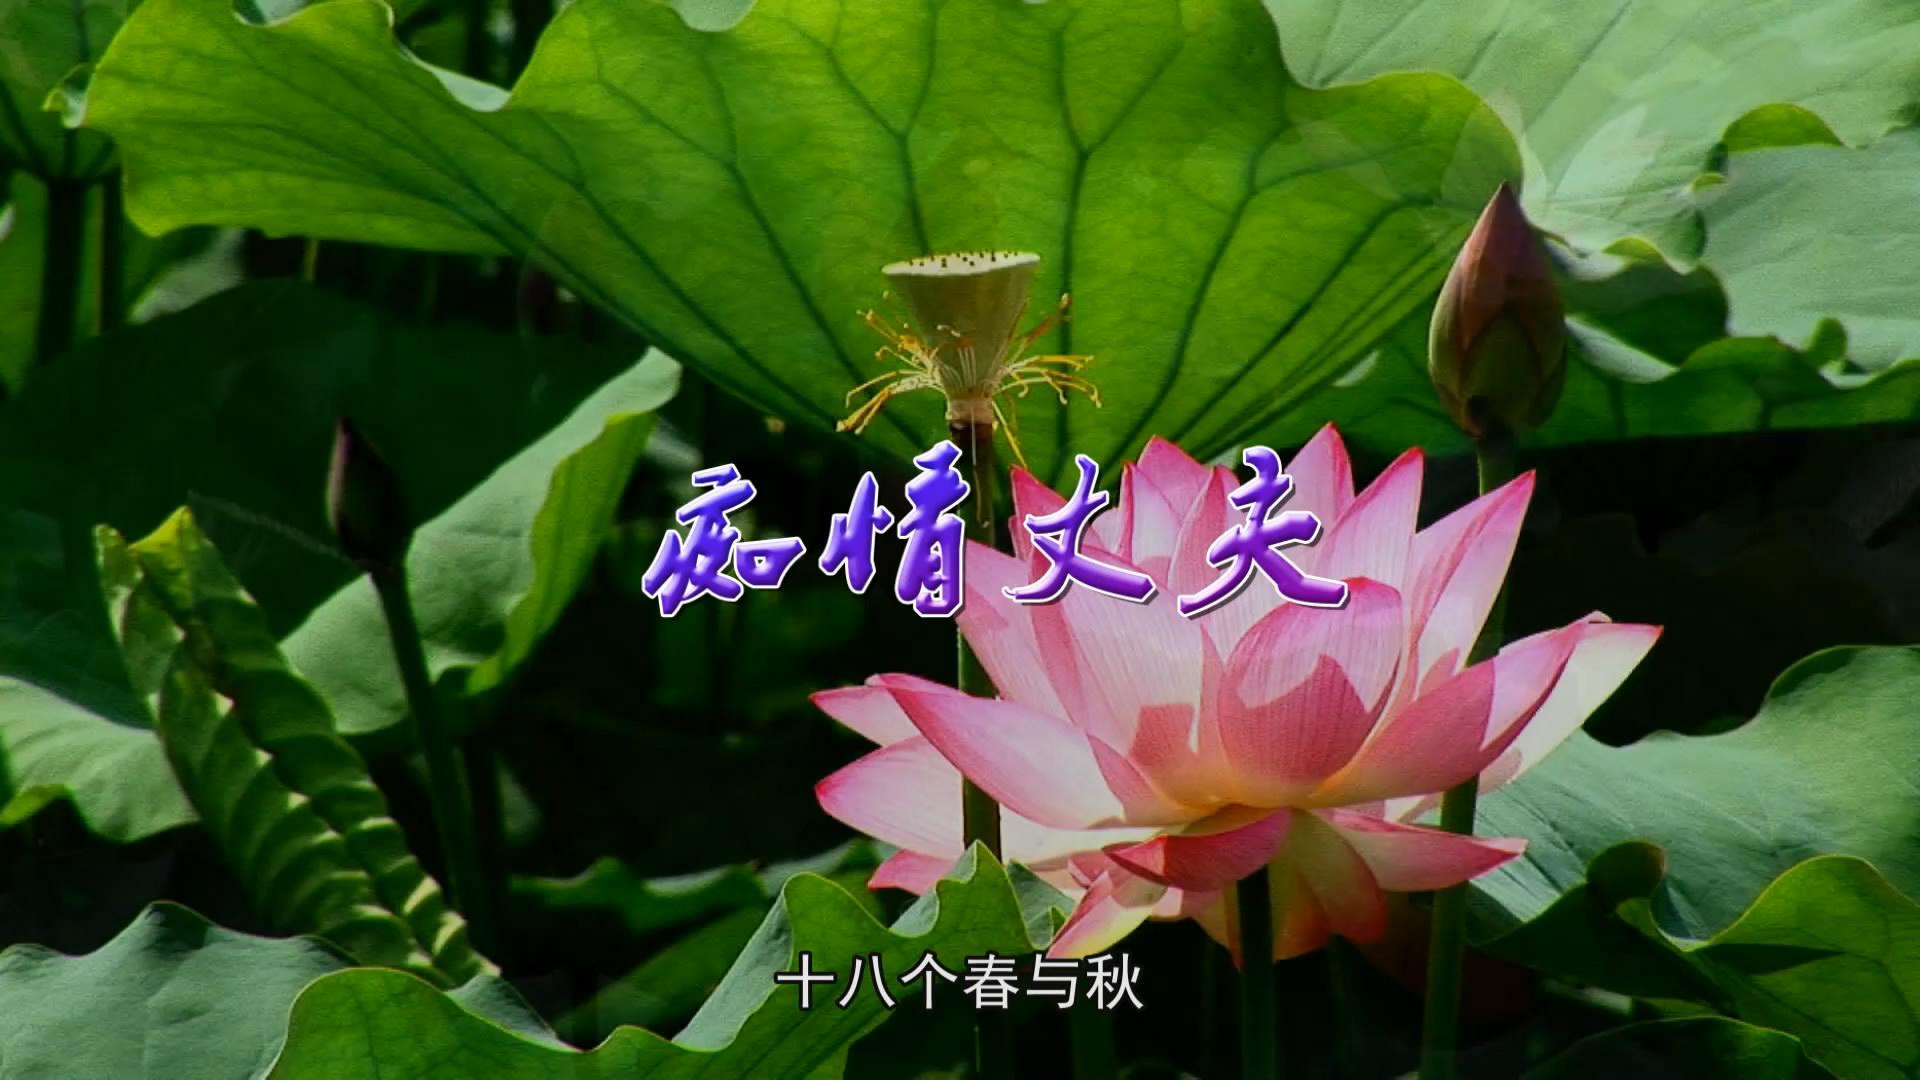 a痴情丈夫输出1无职员表[00_01_58][20181116-150706-0].JPG